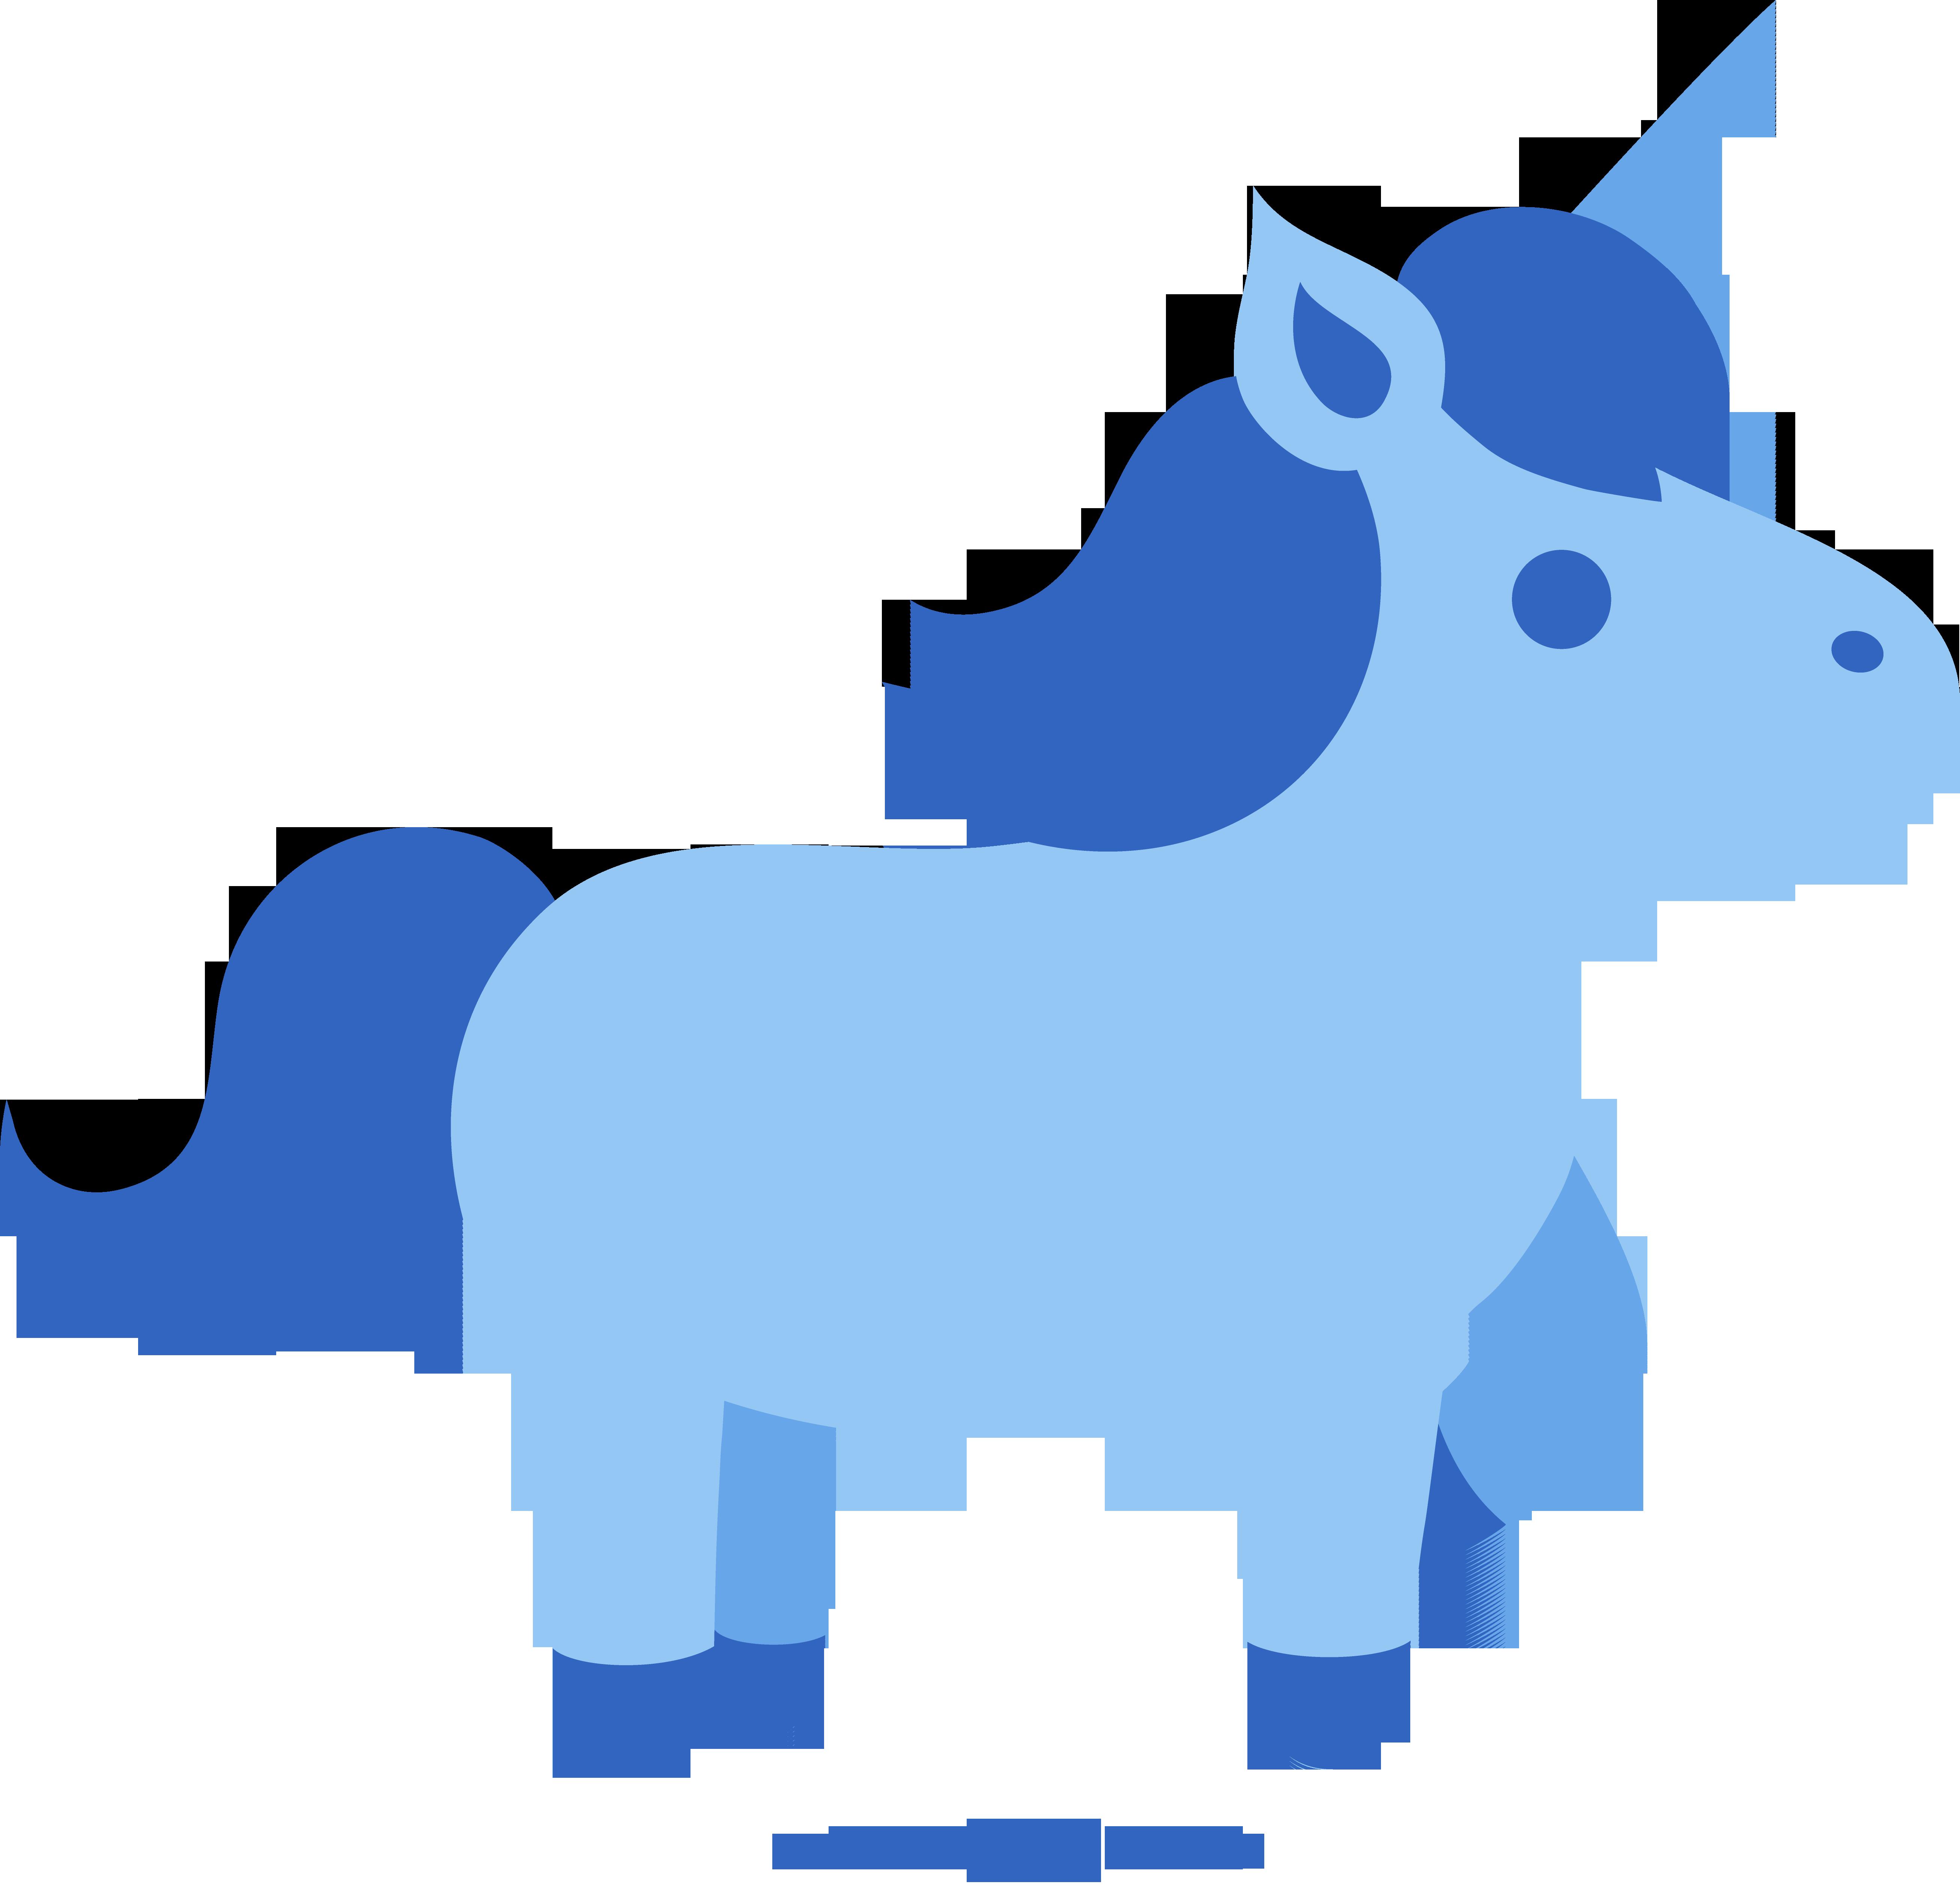 5223x5028 Cute Unicorn Clipart